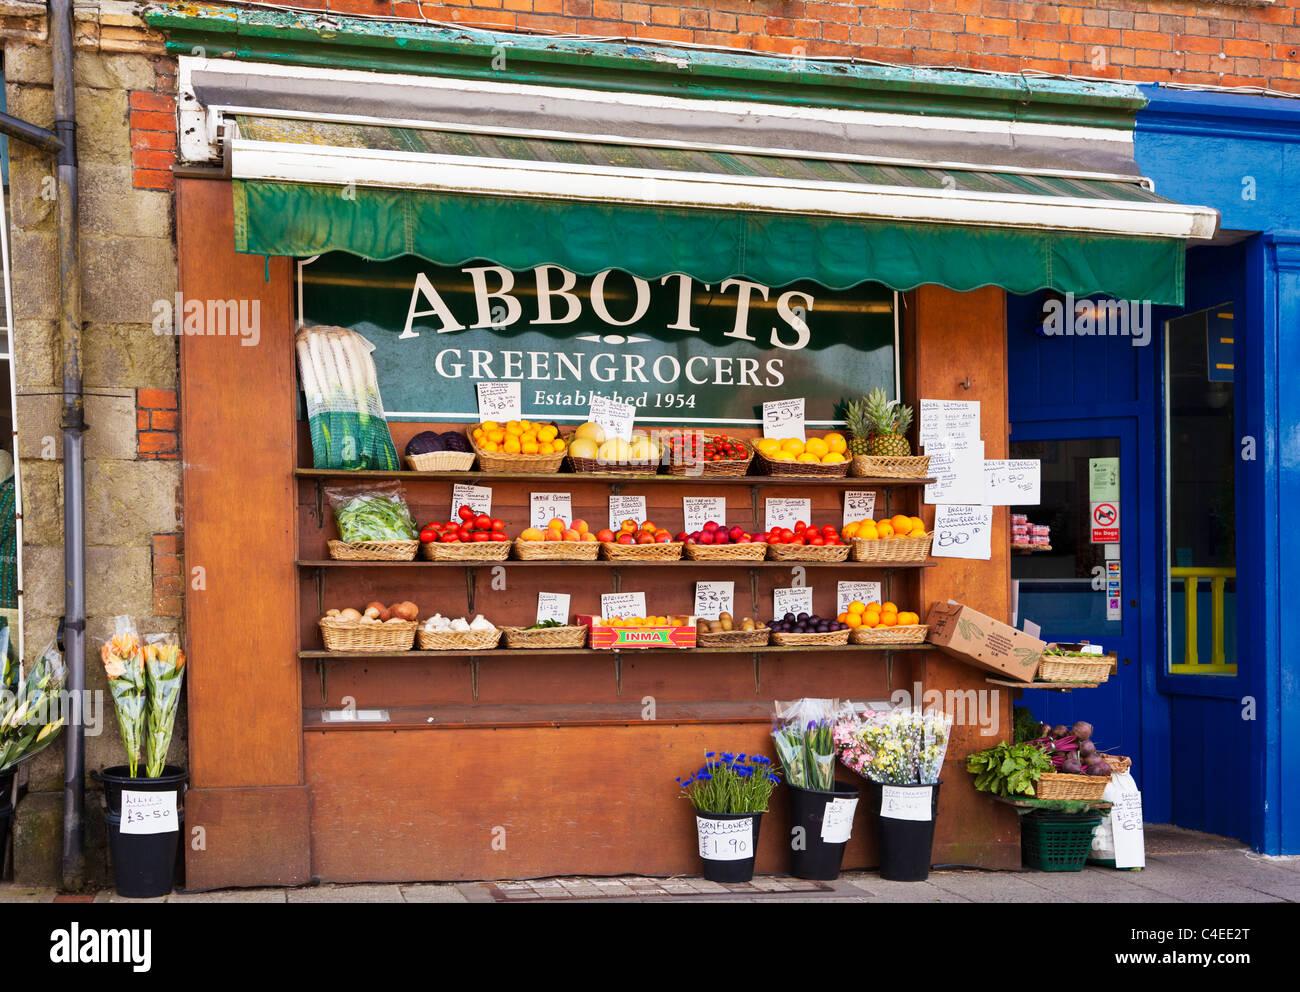 Greengrocer shop in Shaftesbury, Dorset, England UK - Stock Image